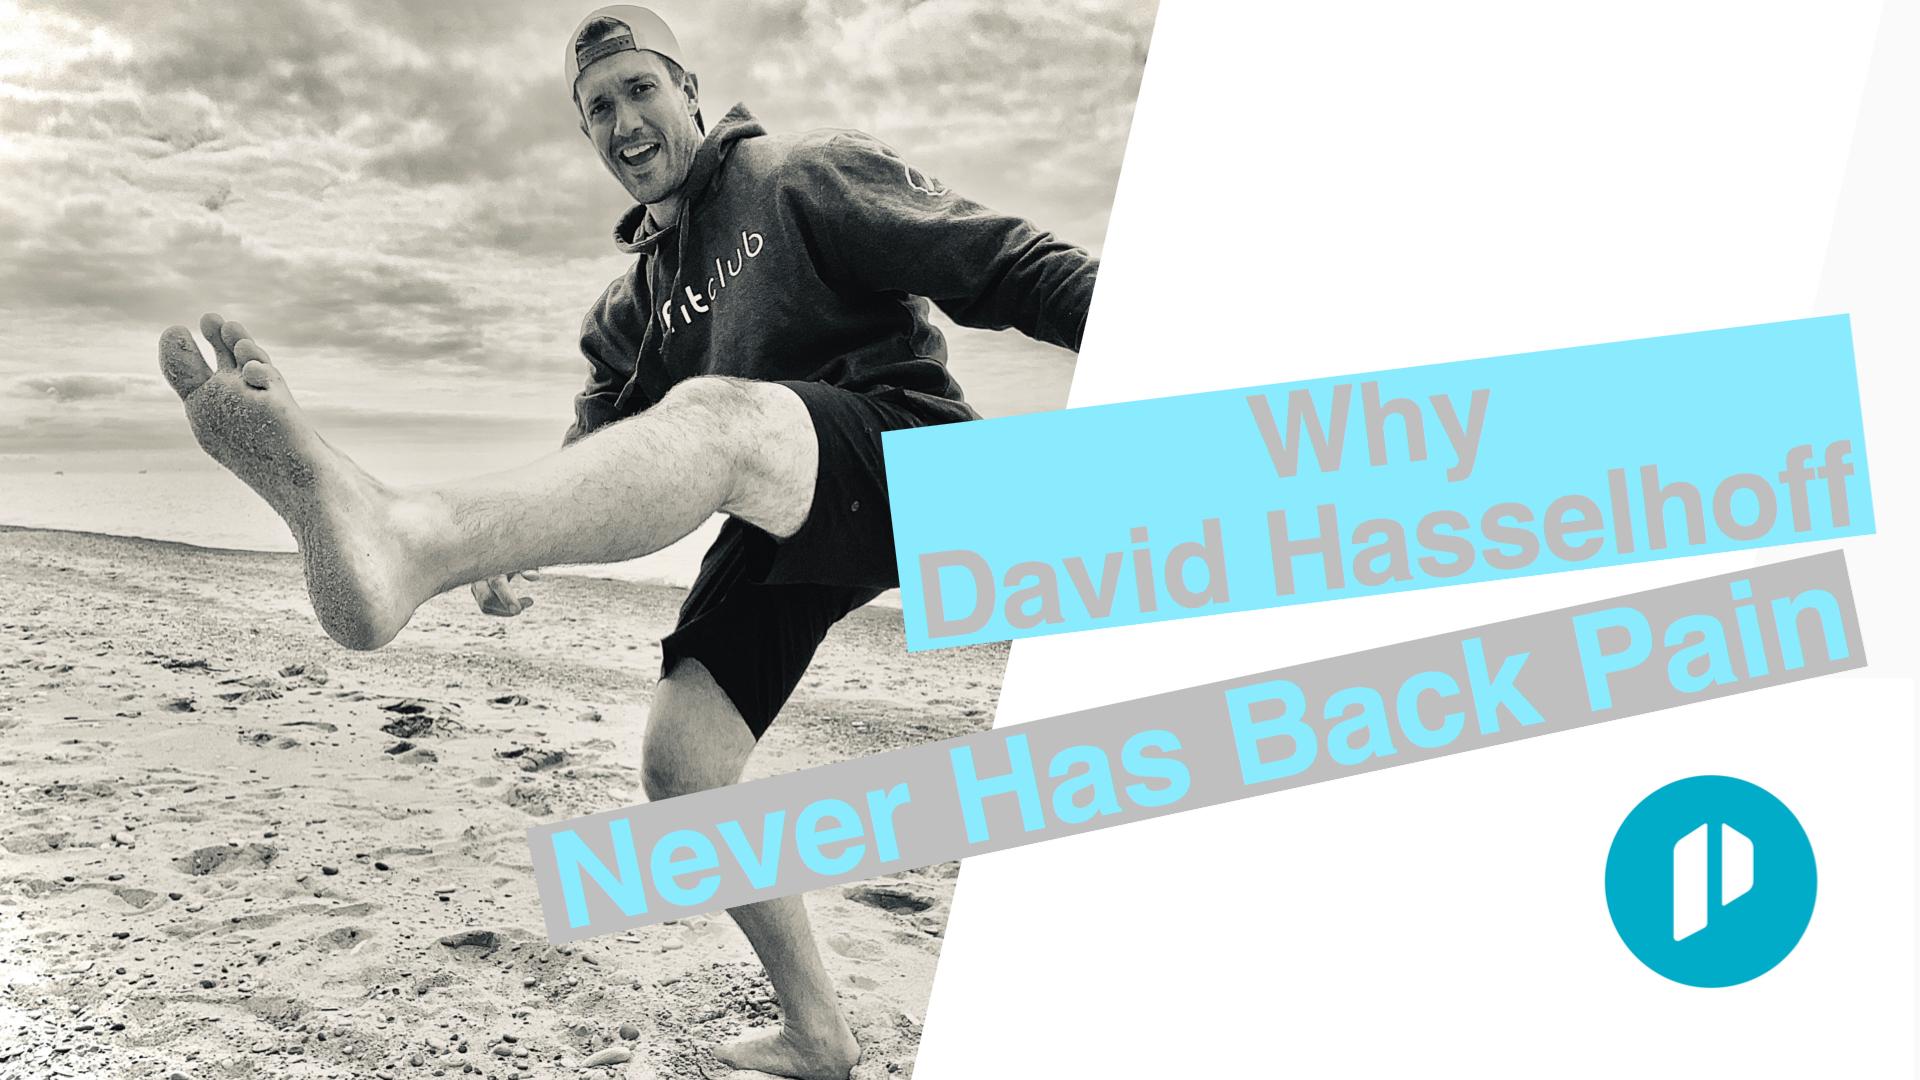 2MT -David hasselfhoff